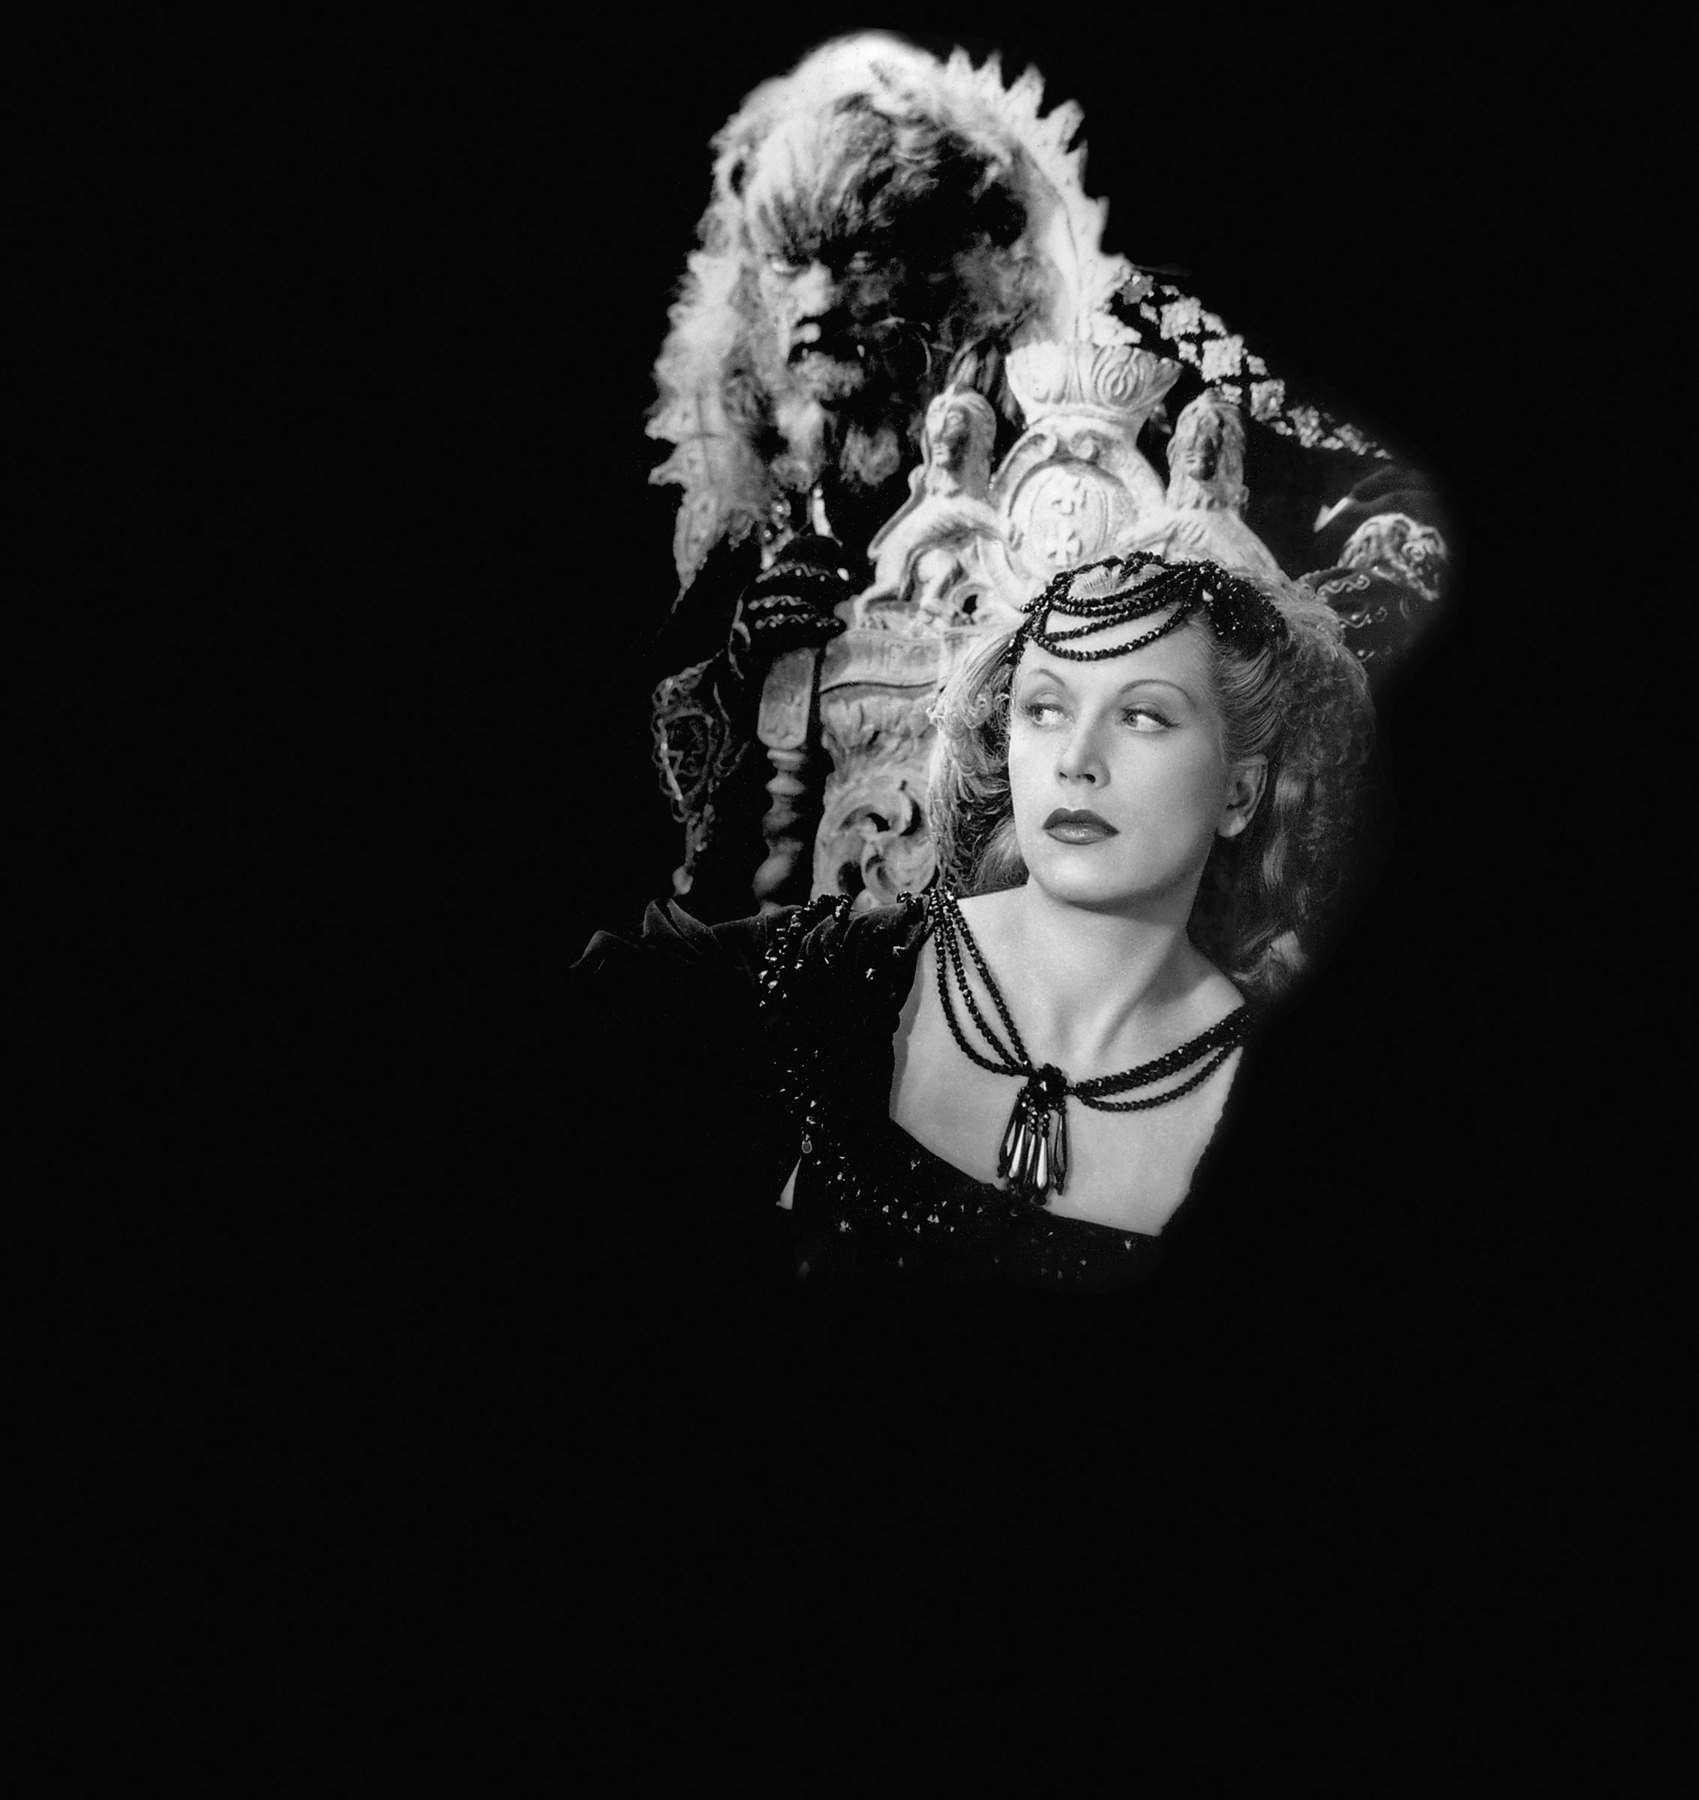 Philip Glass at 75: an intoxicating series, live scores to 'La Belle et la Bête' and more